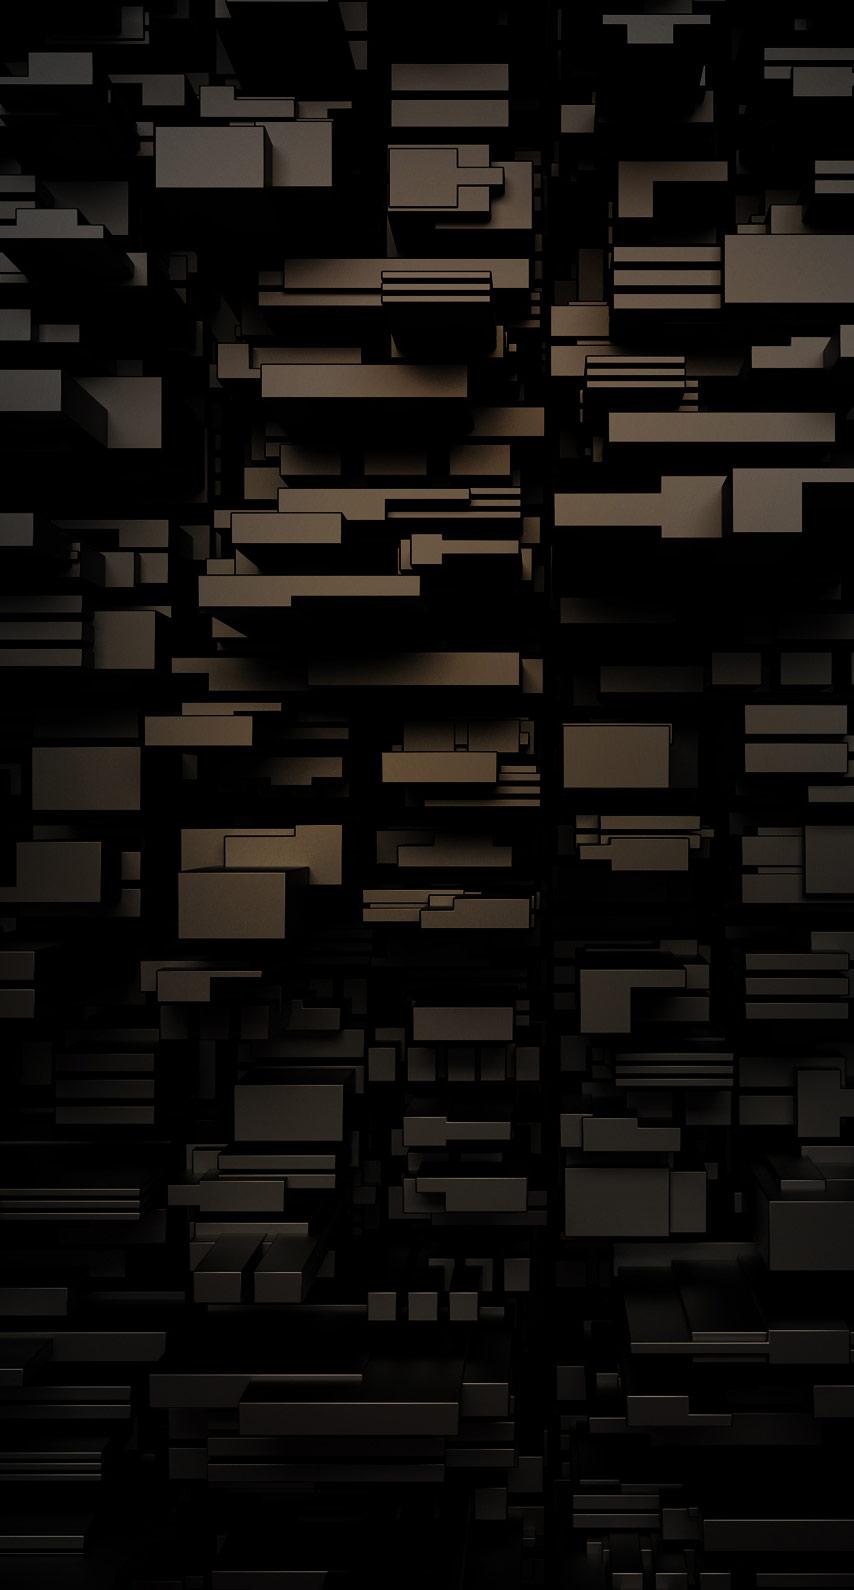 mosaic, cube